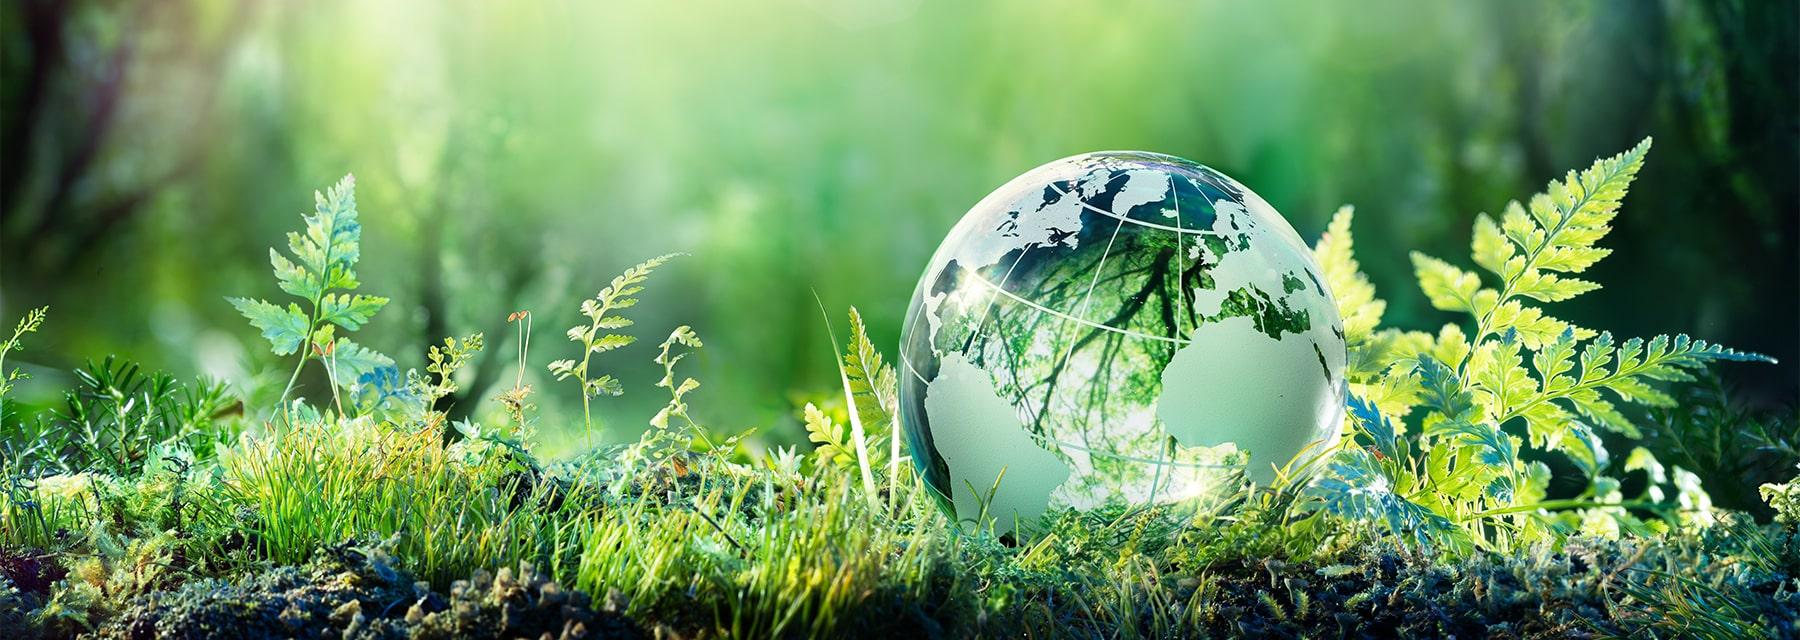 glass globe laid on grass